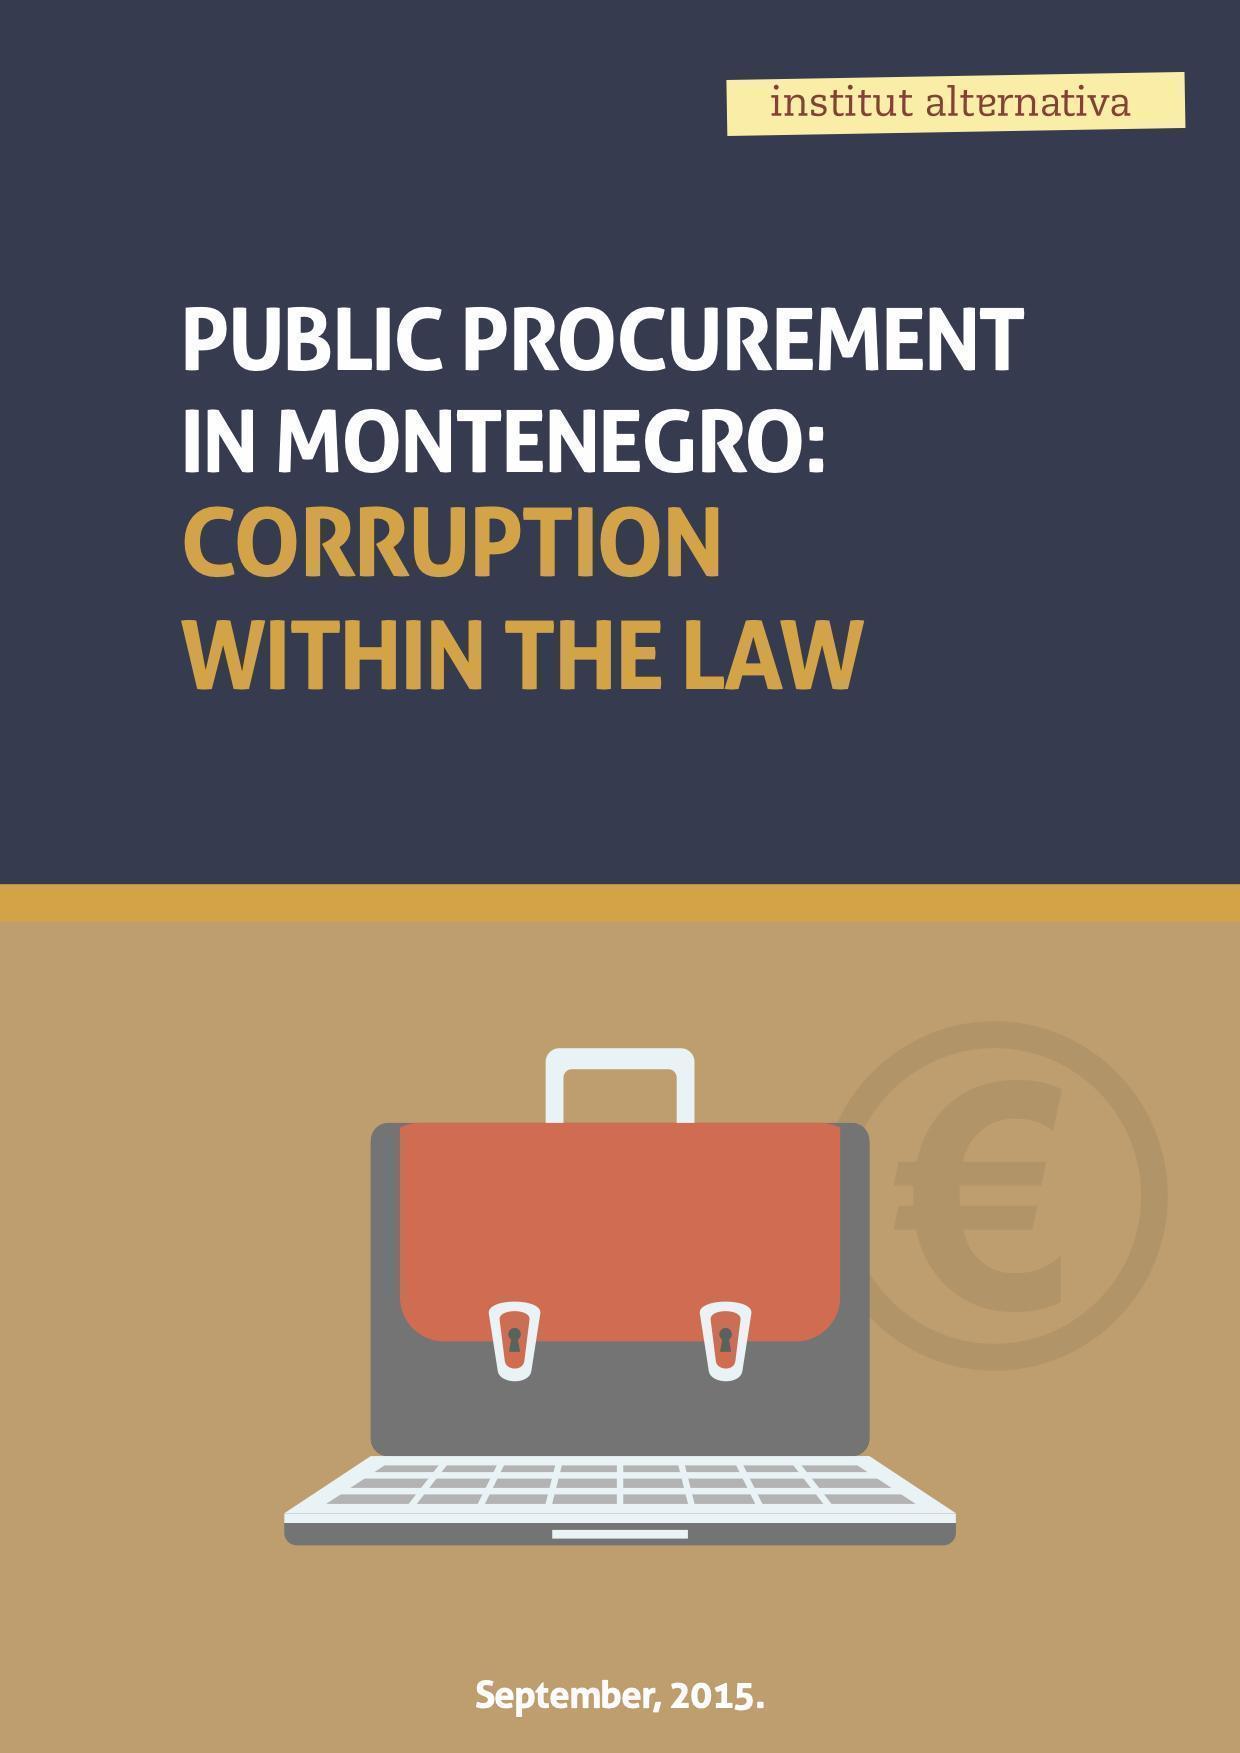 Public procurement in Montenegro: Corruption within the law